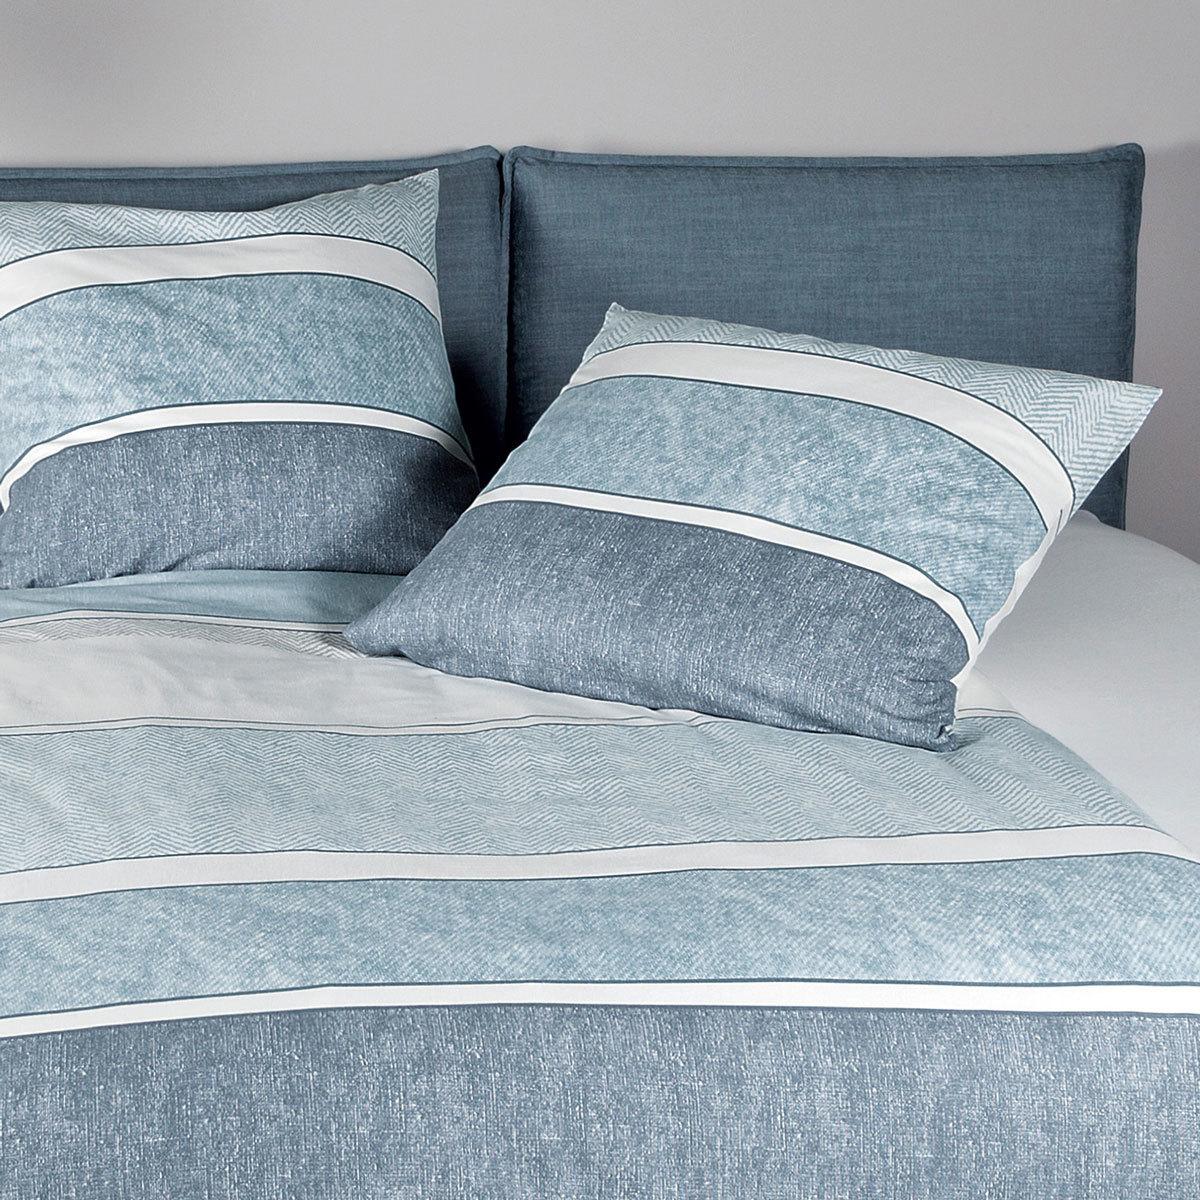 janine biber bettw sche davos 65047 02 blau g nstig online. Black Bedroom Furniture Sets. Home Design Ideas